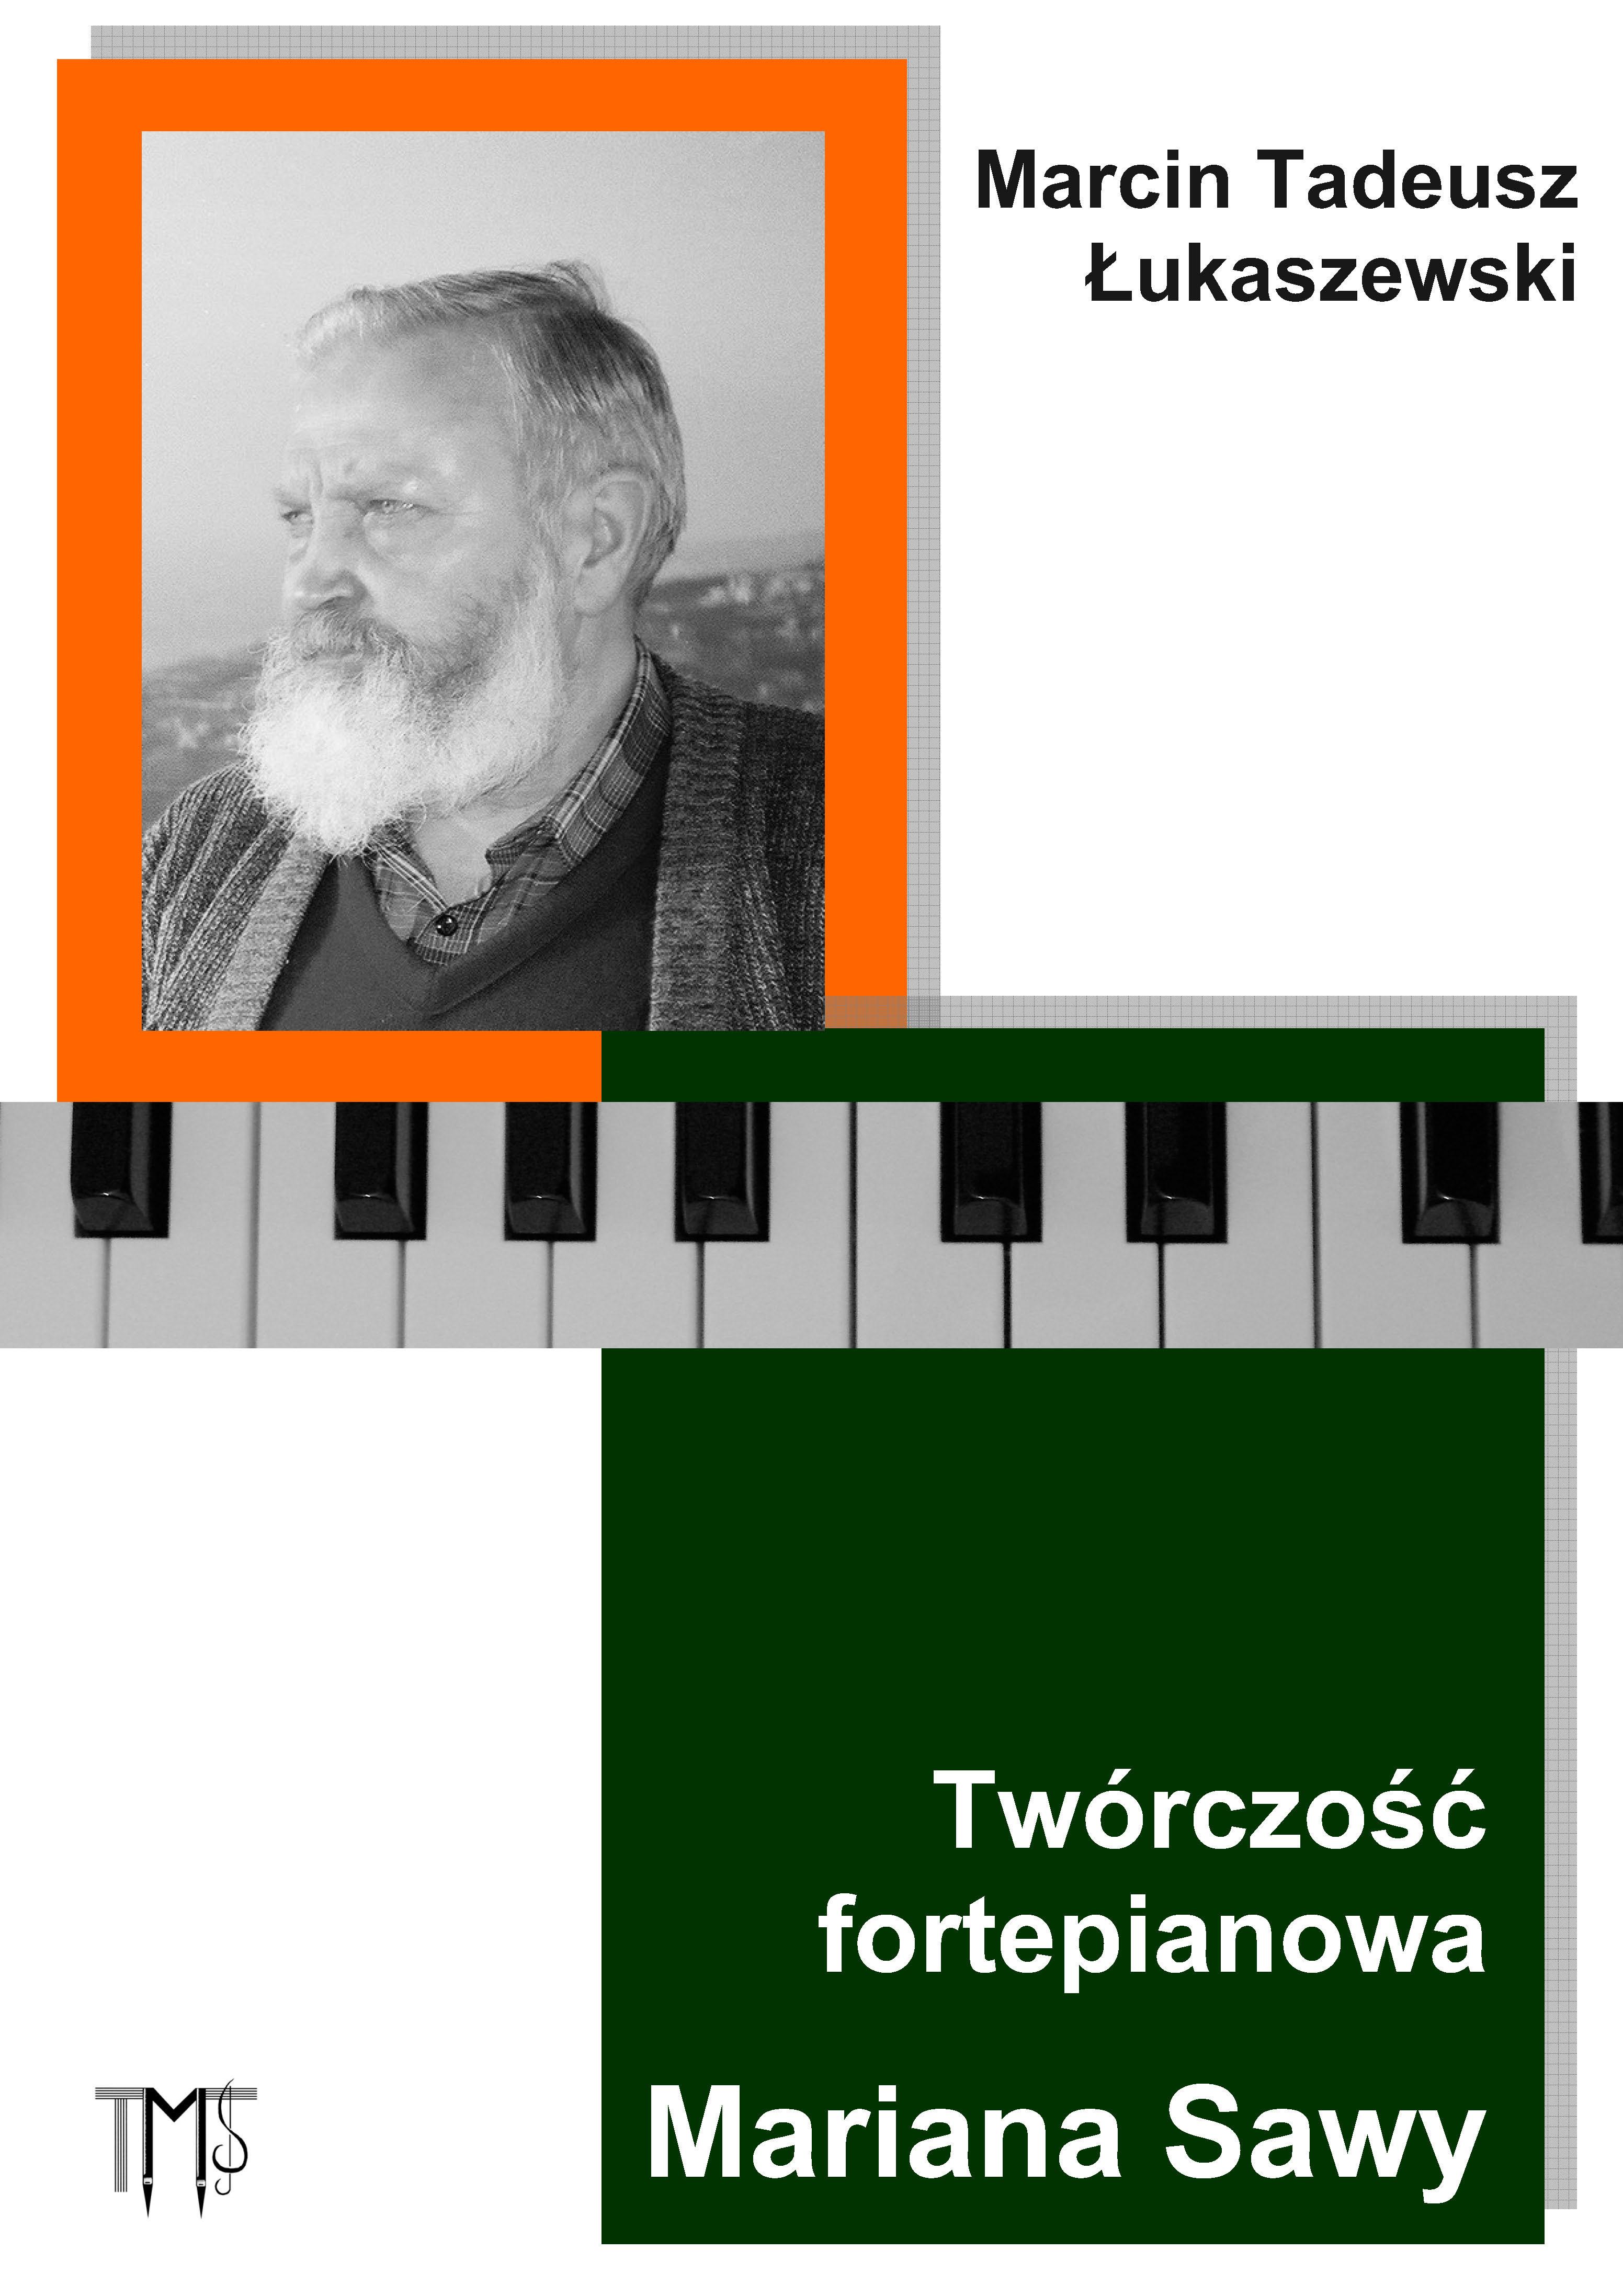 _ukaszewski_Sawa_okladka_awers.jpg